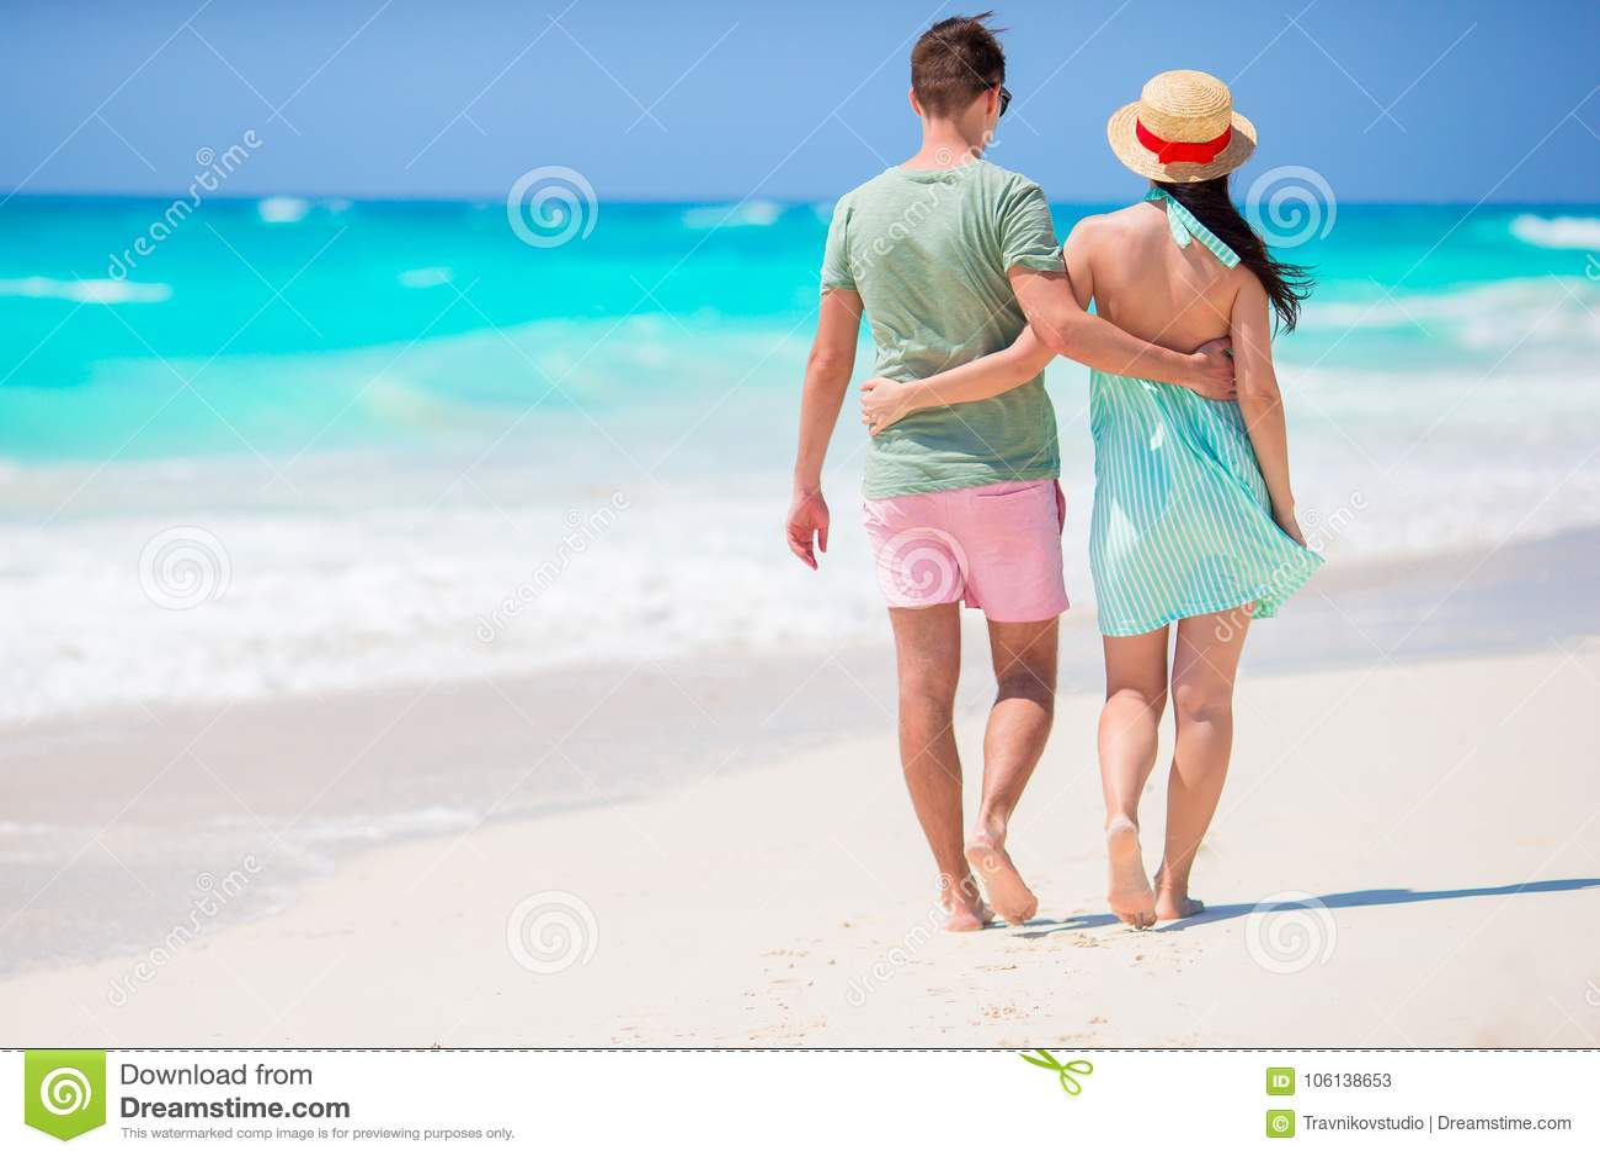 Couple enjoy their vacation